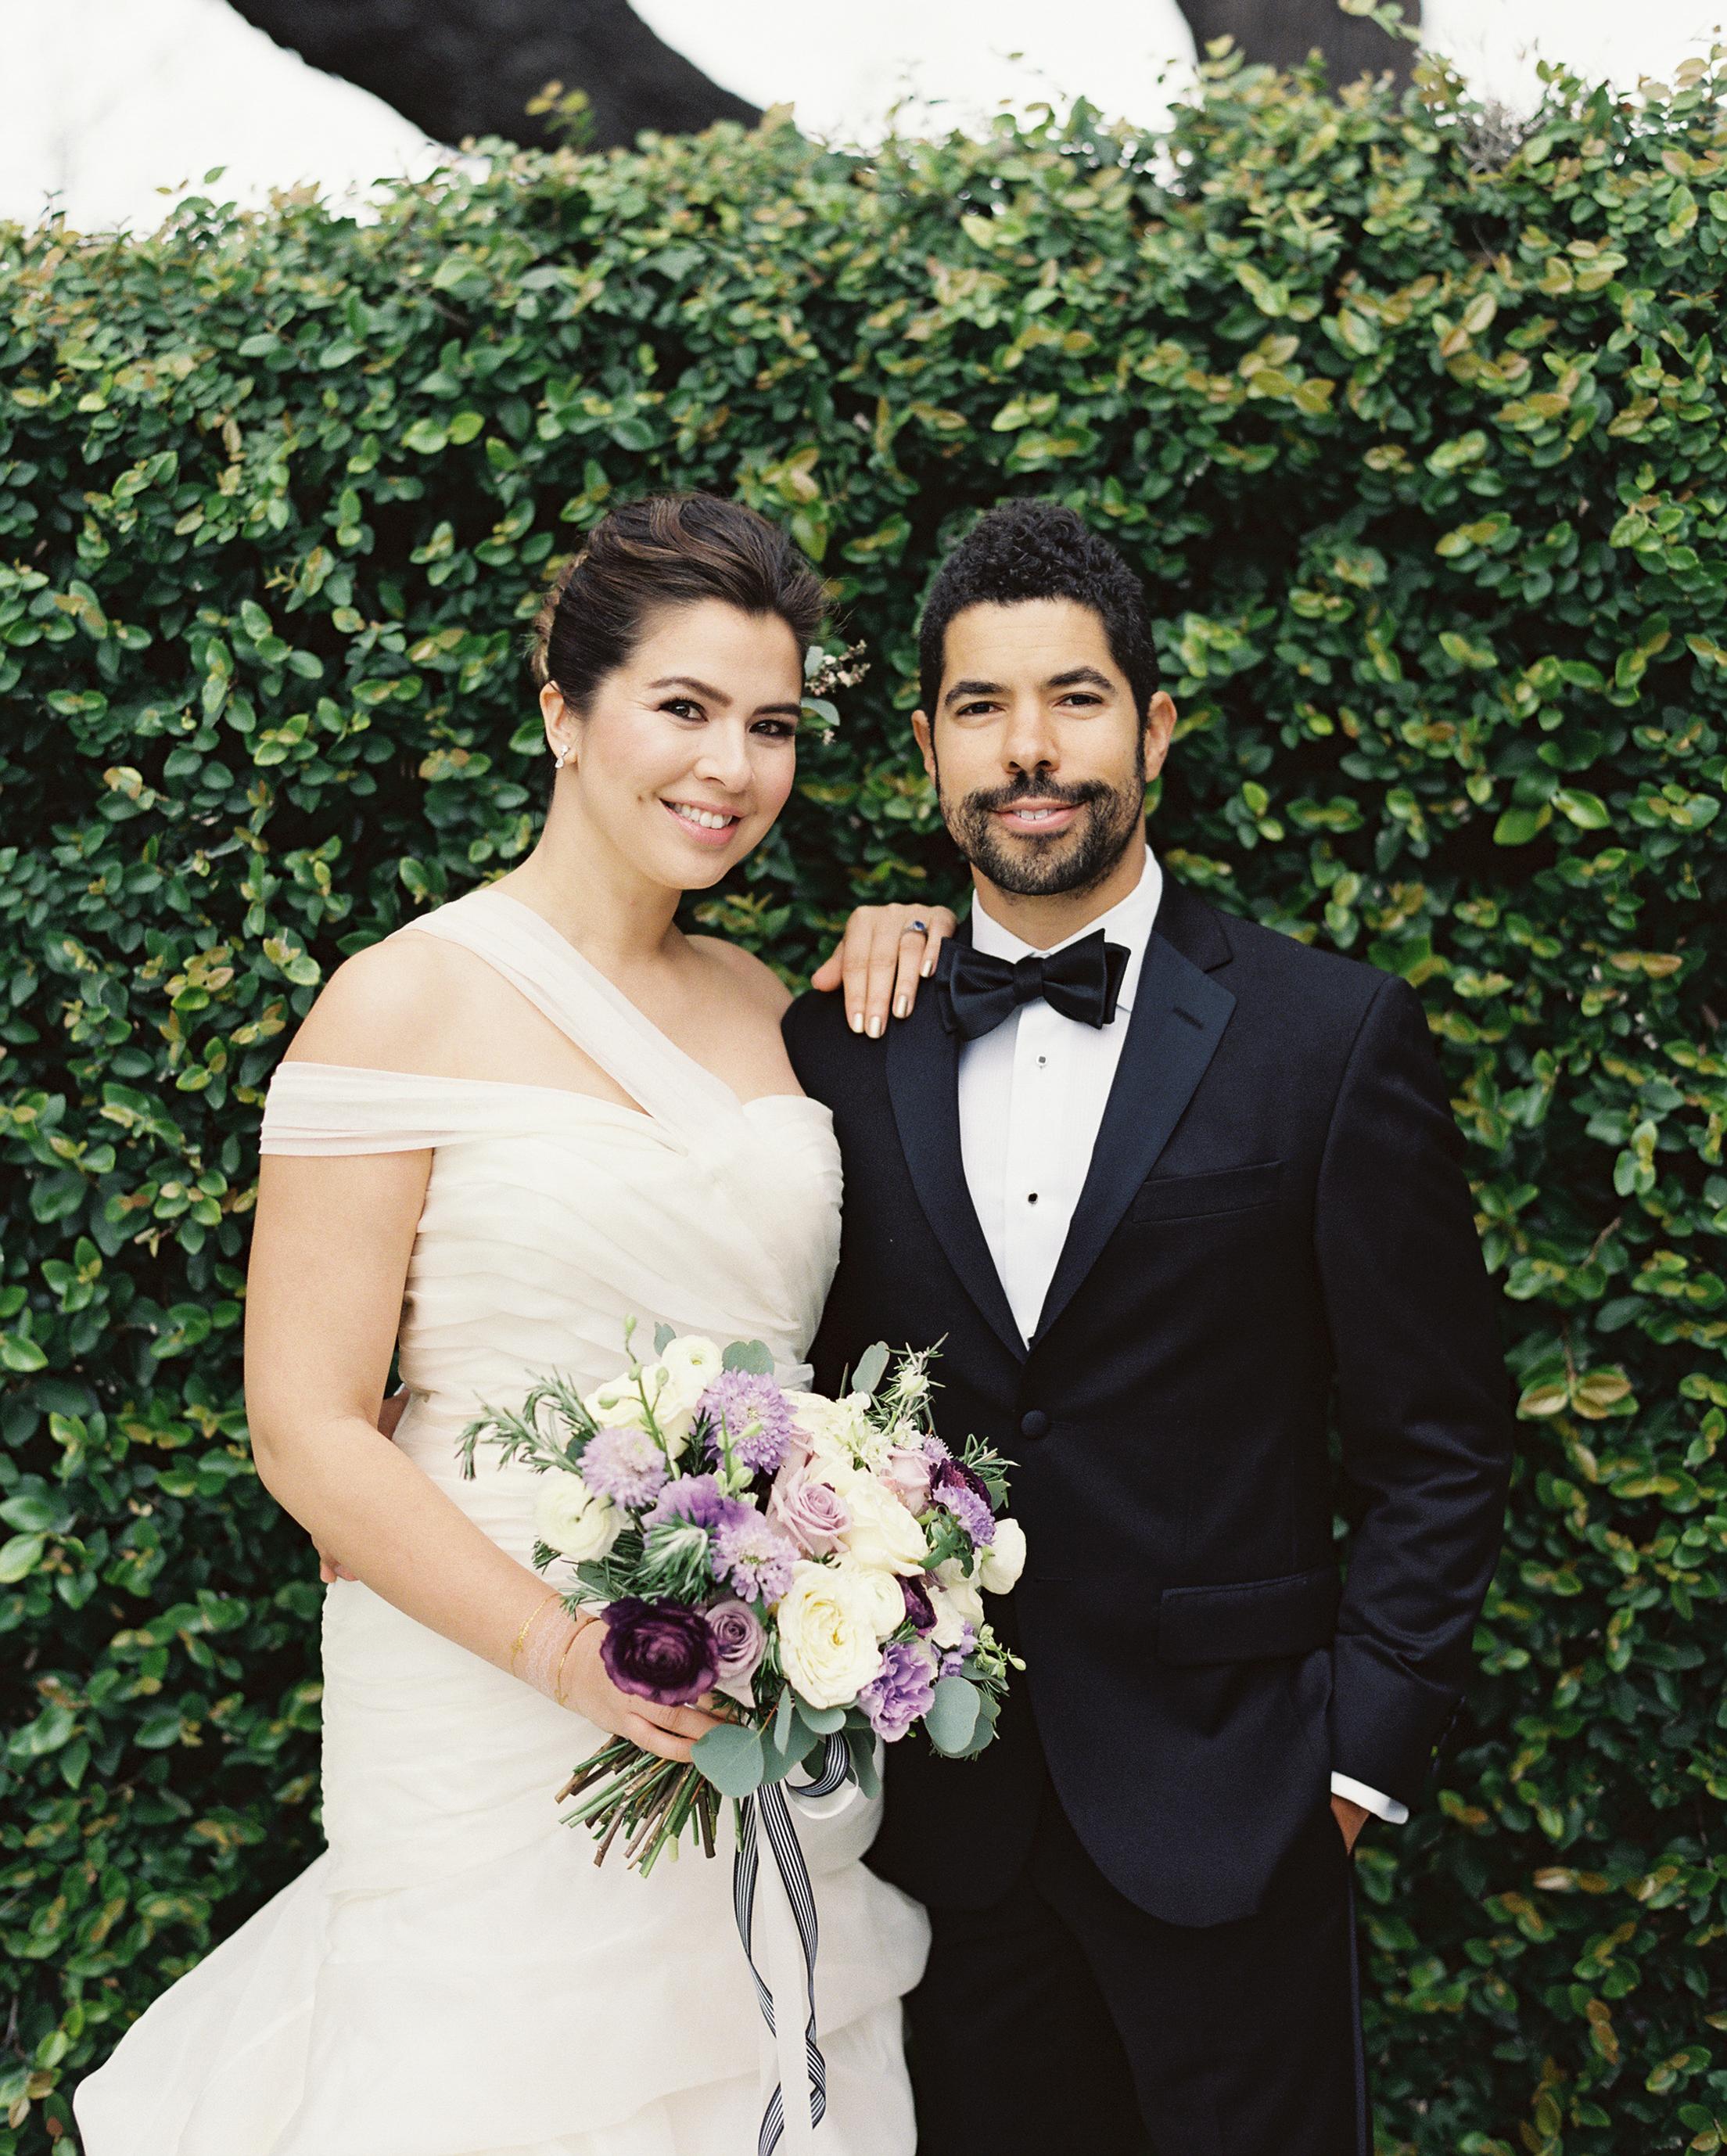 stacey-adam-wedding-couple-0032-s112112-0815.jpg